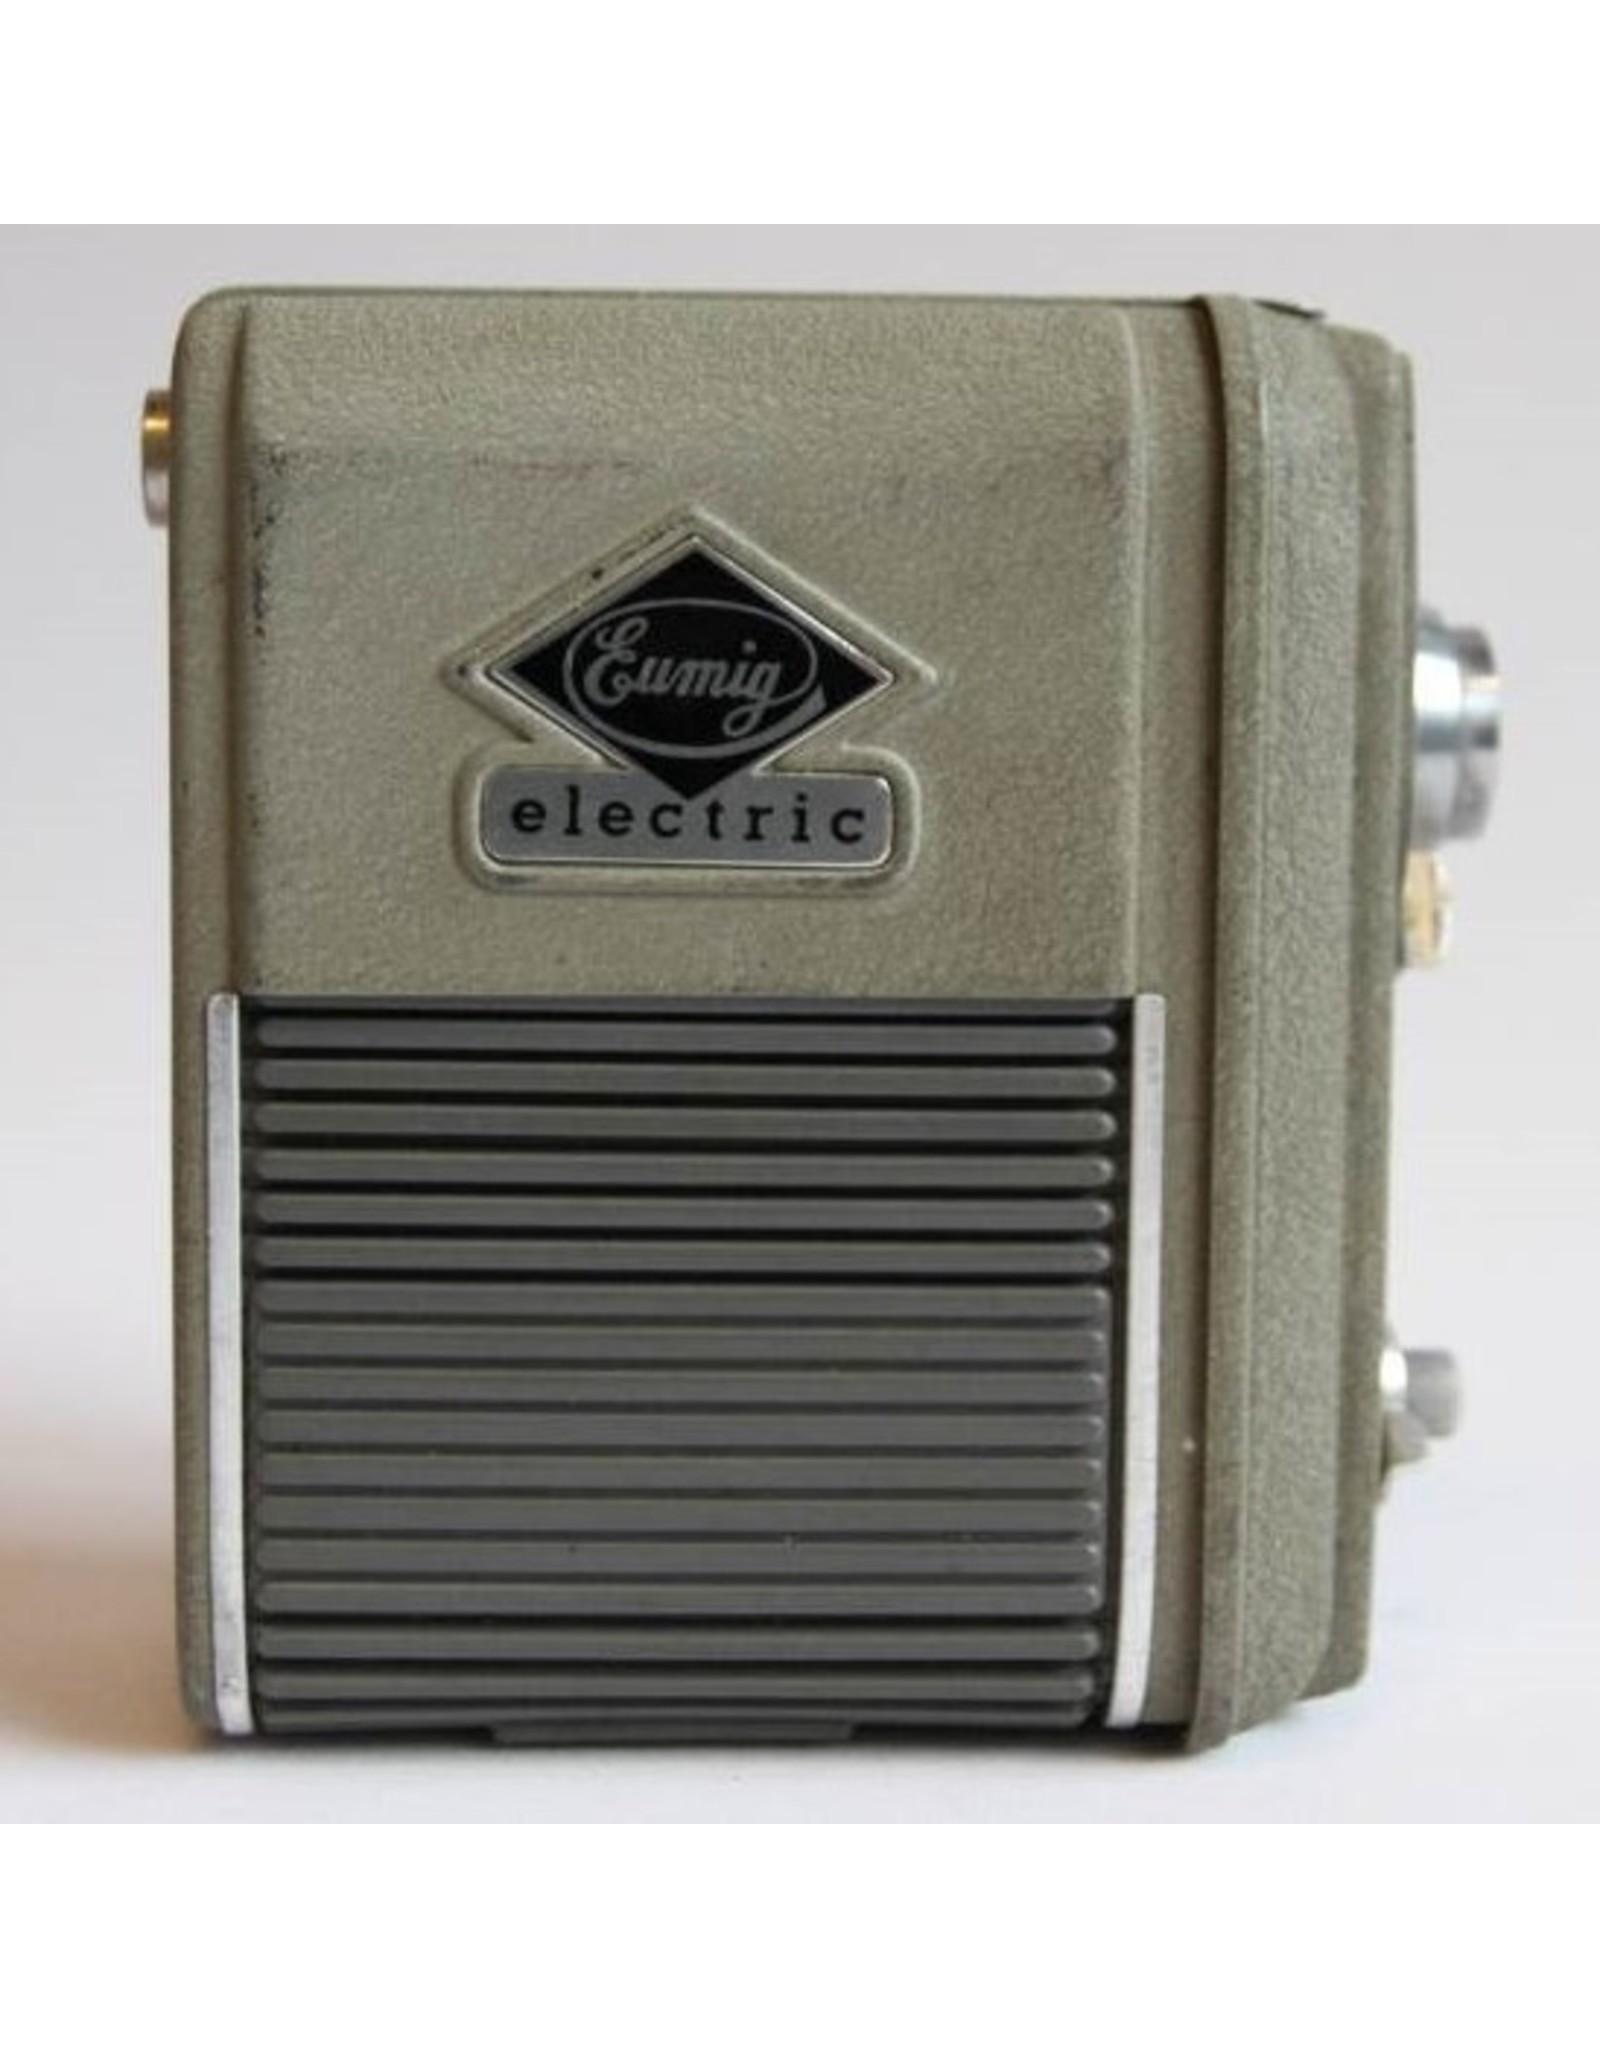 Camera - Eumig 8mm film movie camera Austria 1950s